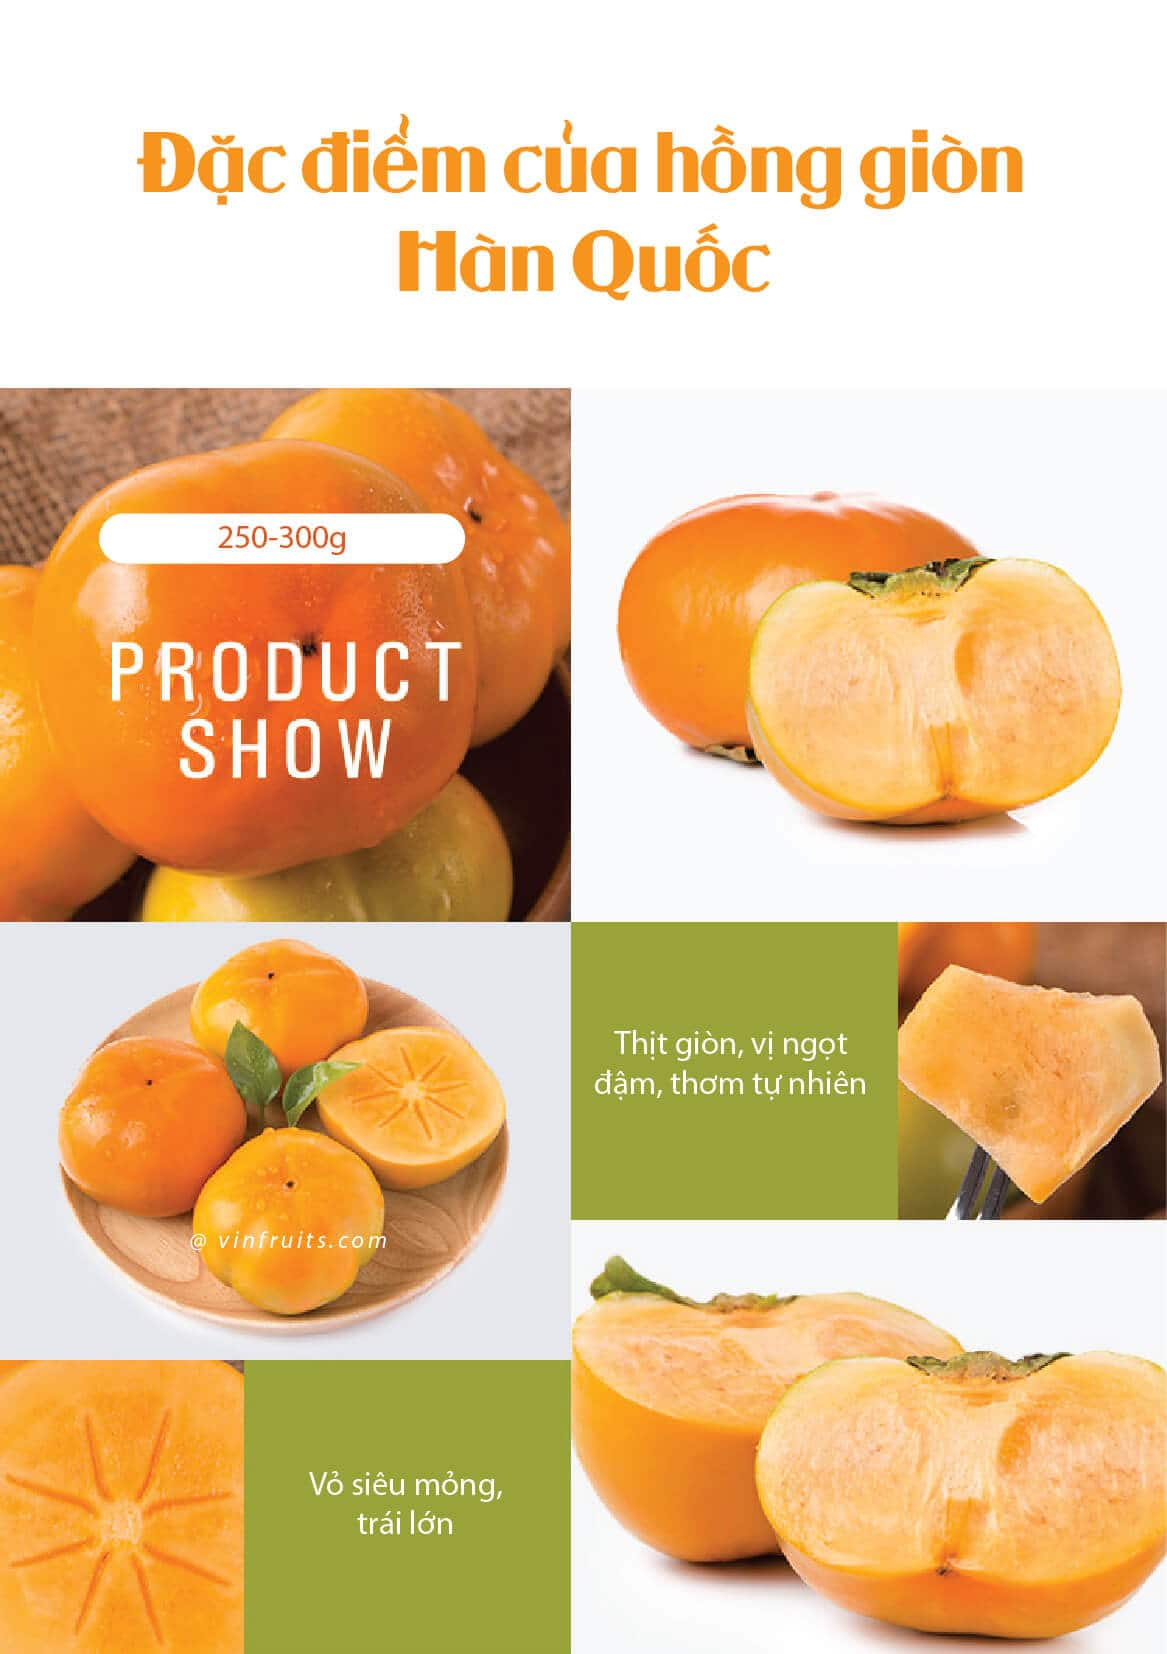 Hong gion Han Quoc - vinfruits 5